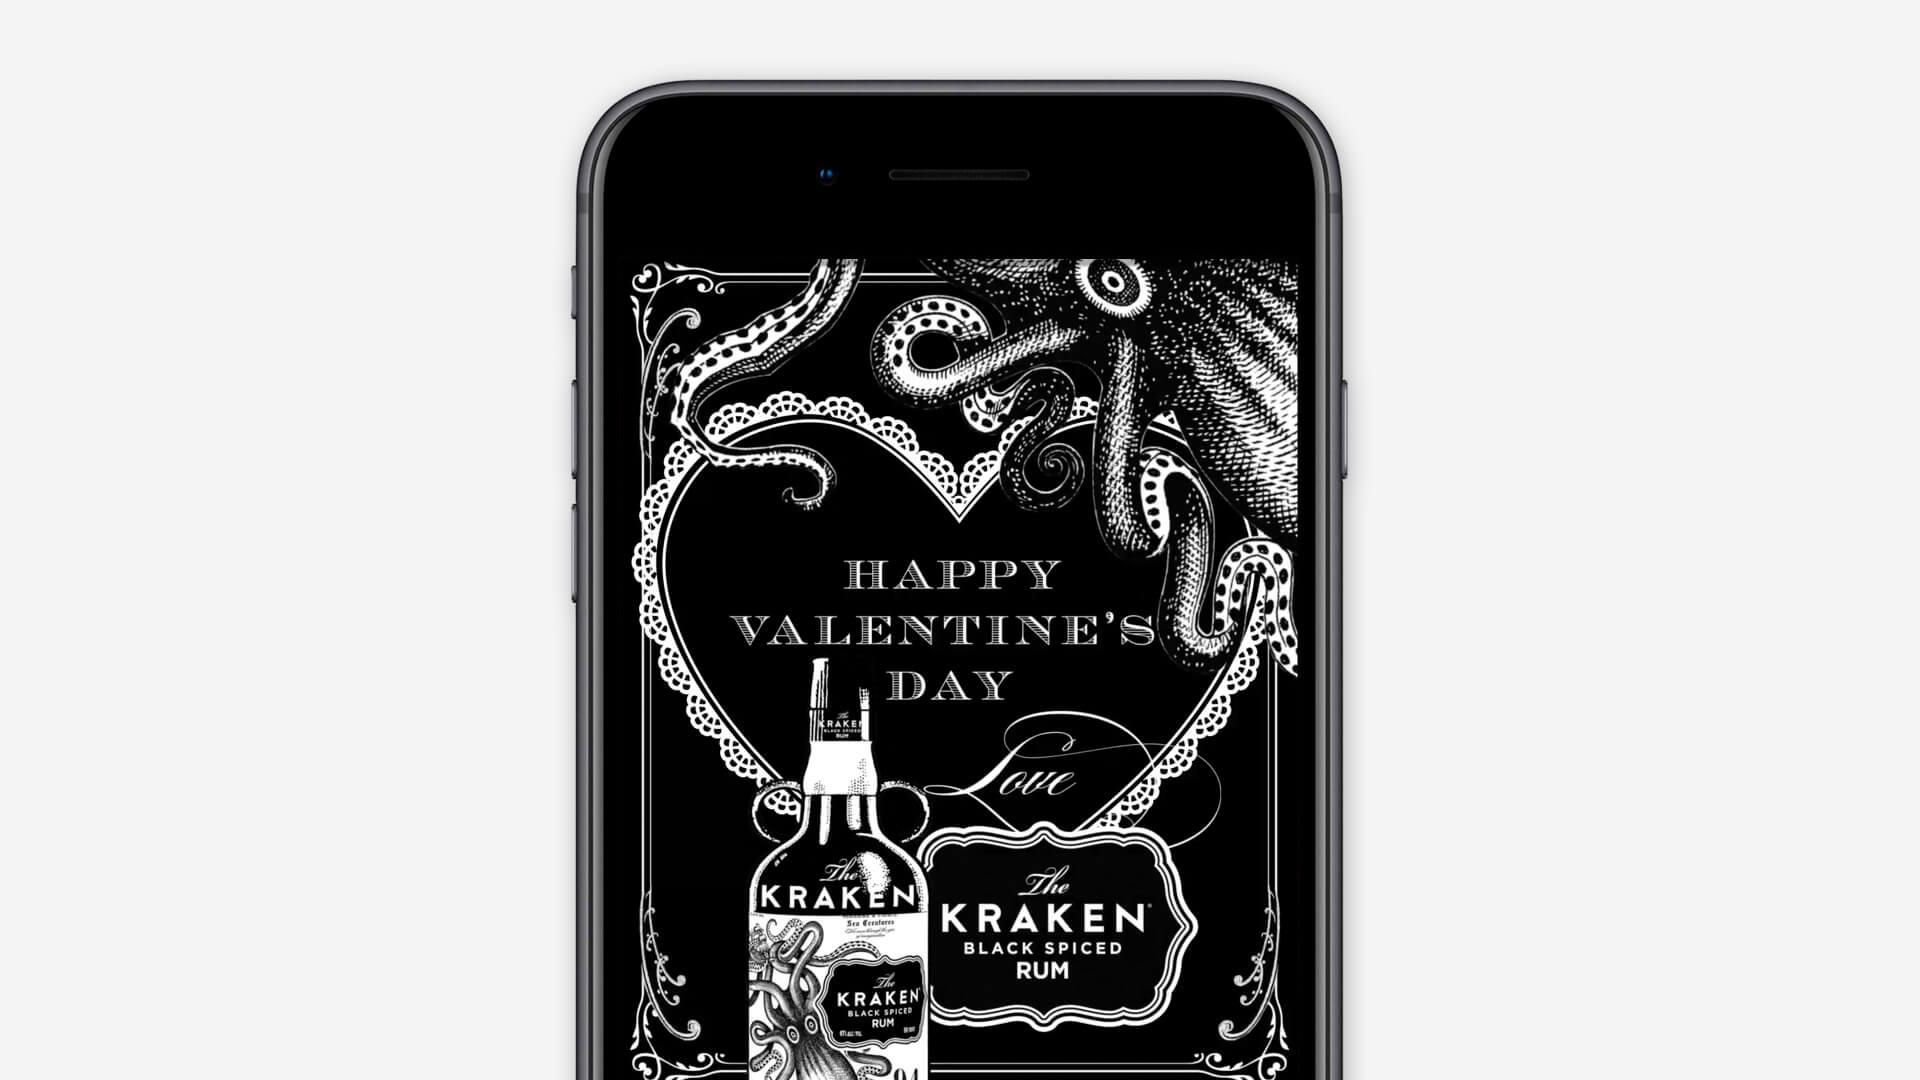 Kraken - Valentine's Day Social